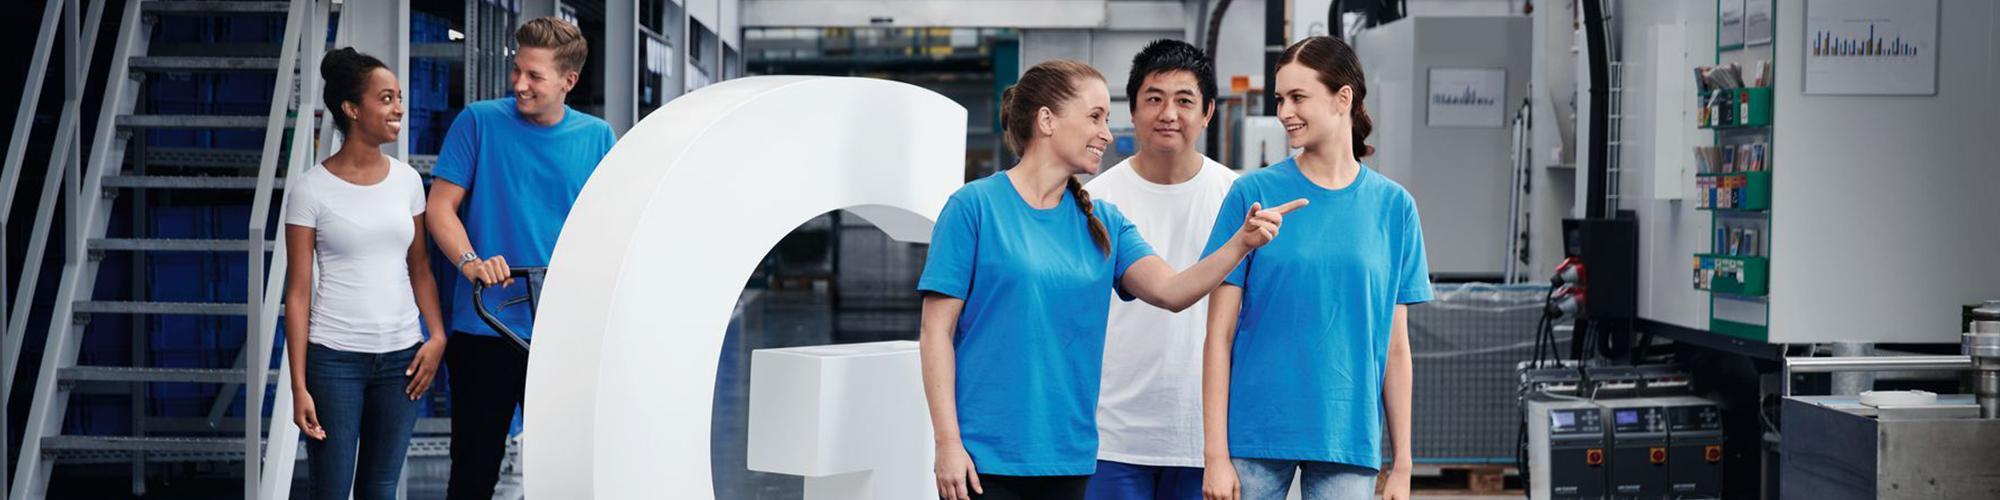 Geberit Produktions GmbH & Co KG